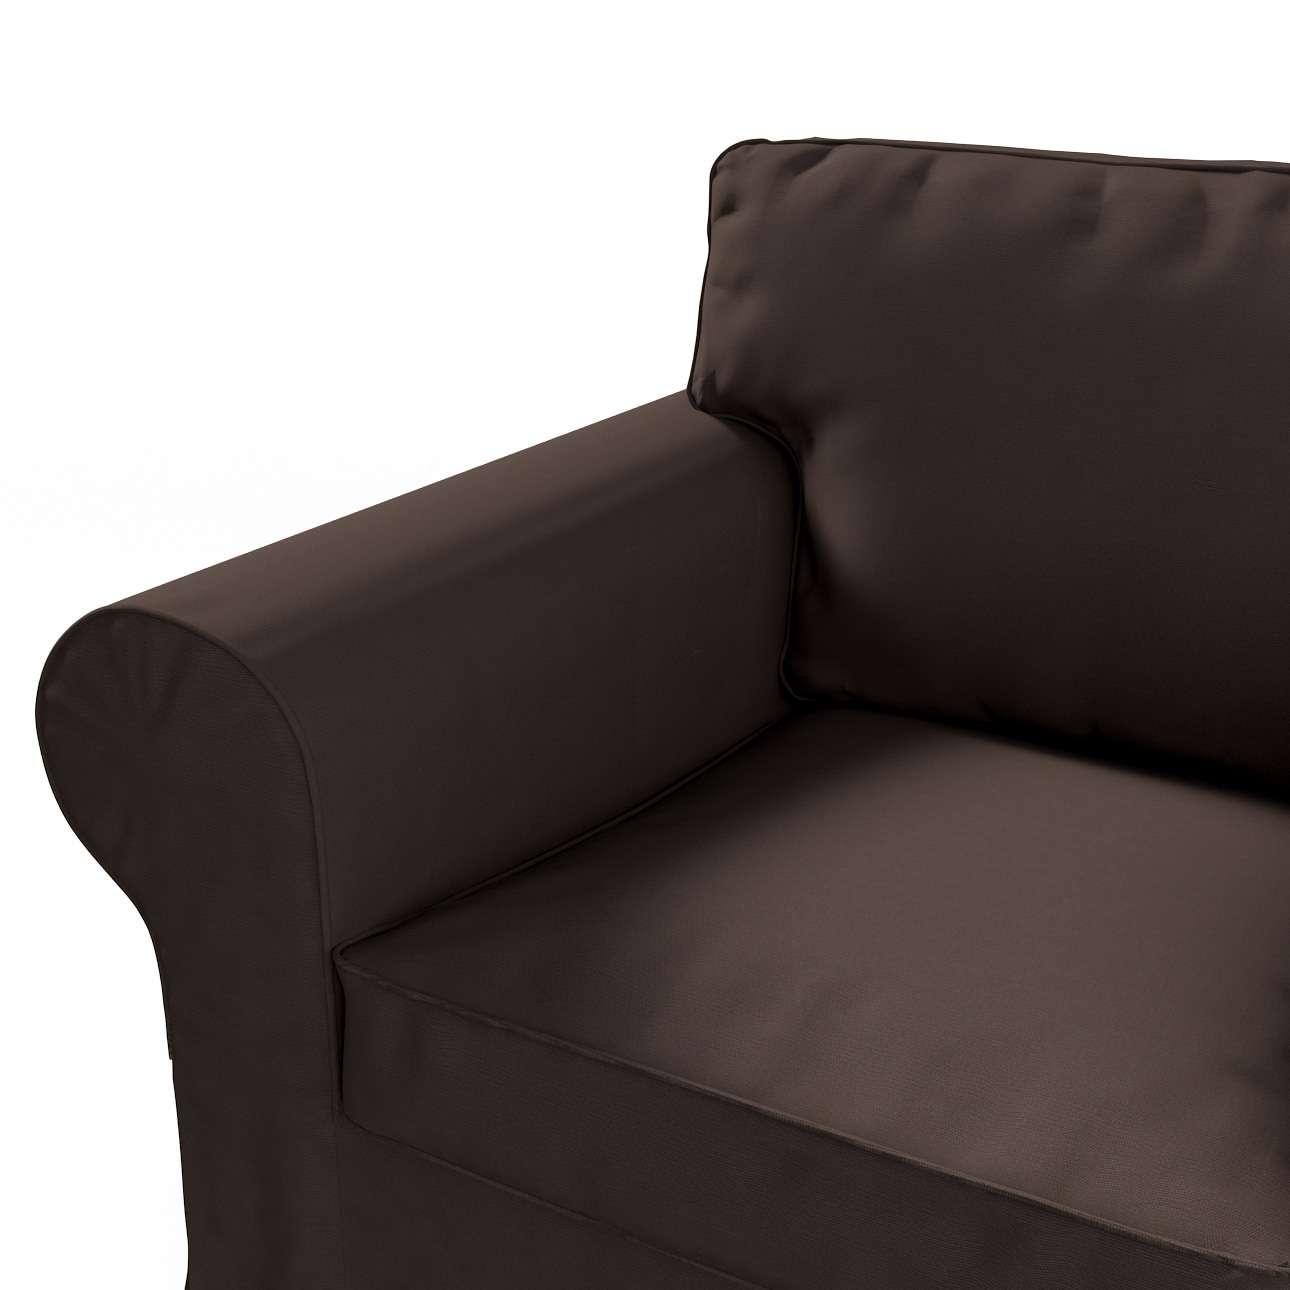 Potah na křeslo IKEA Ektorp kØeslo Ektorp v kolekci Cotton Panama, látka: 702-03